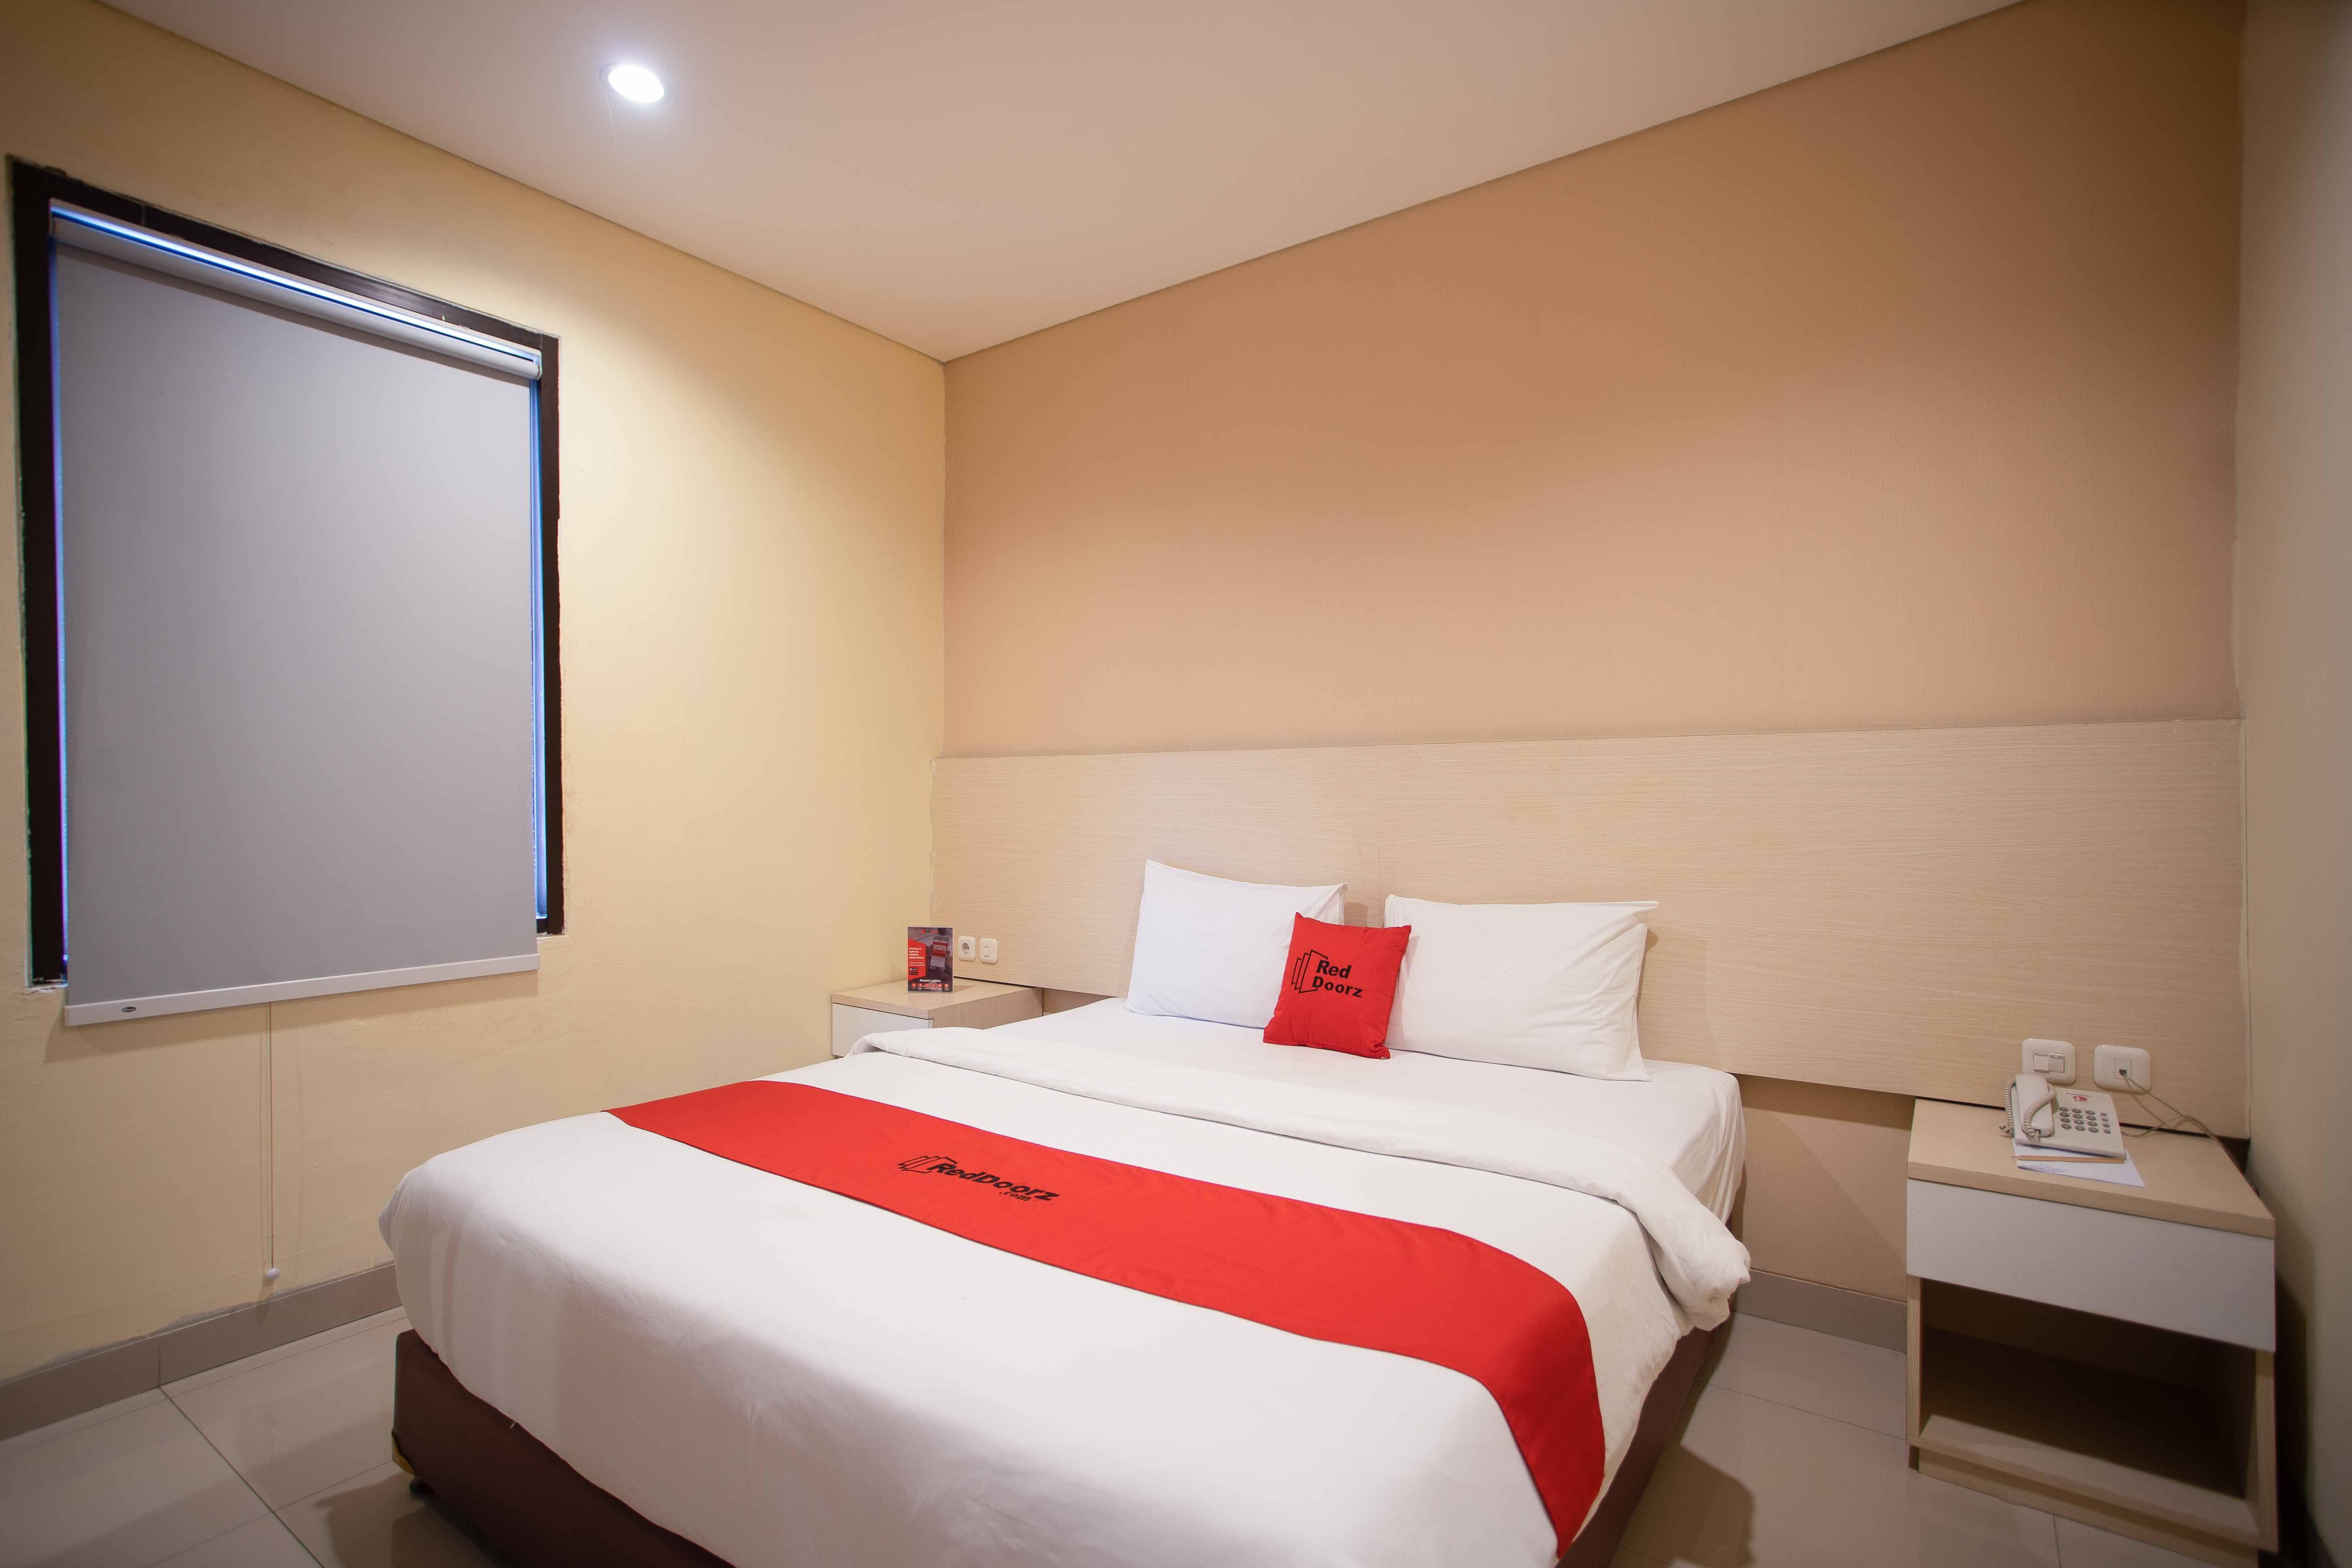 RedDoorz Premium near Kawasan Industri Cikarang, Cikarang